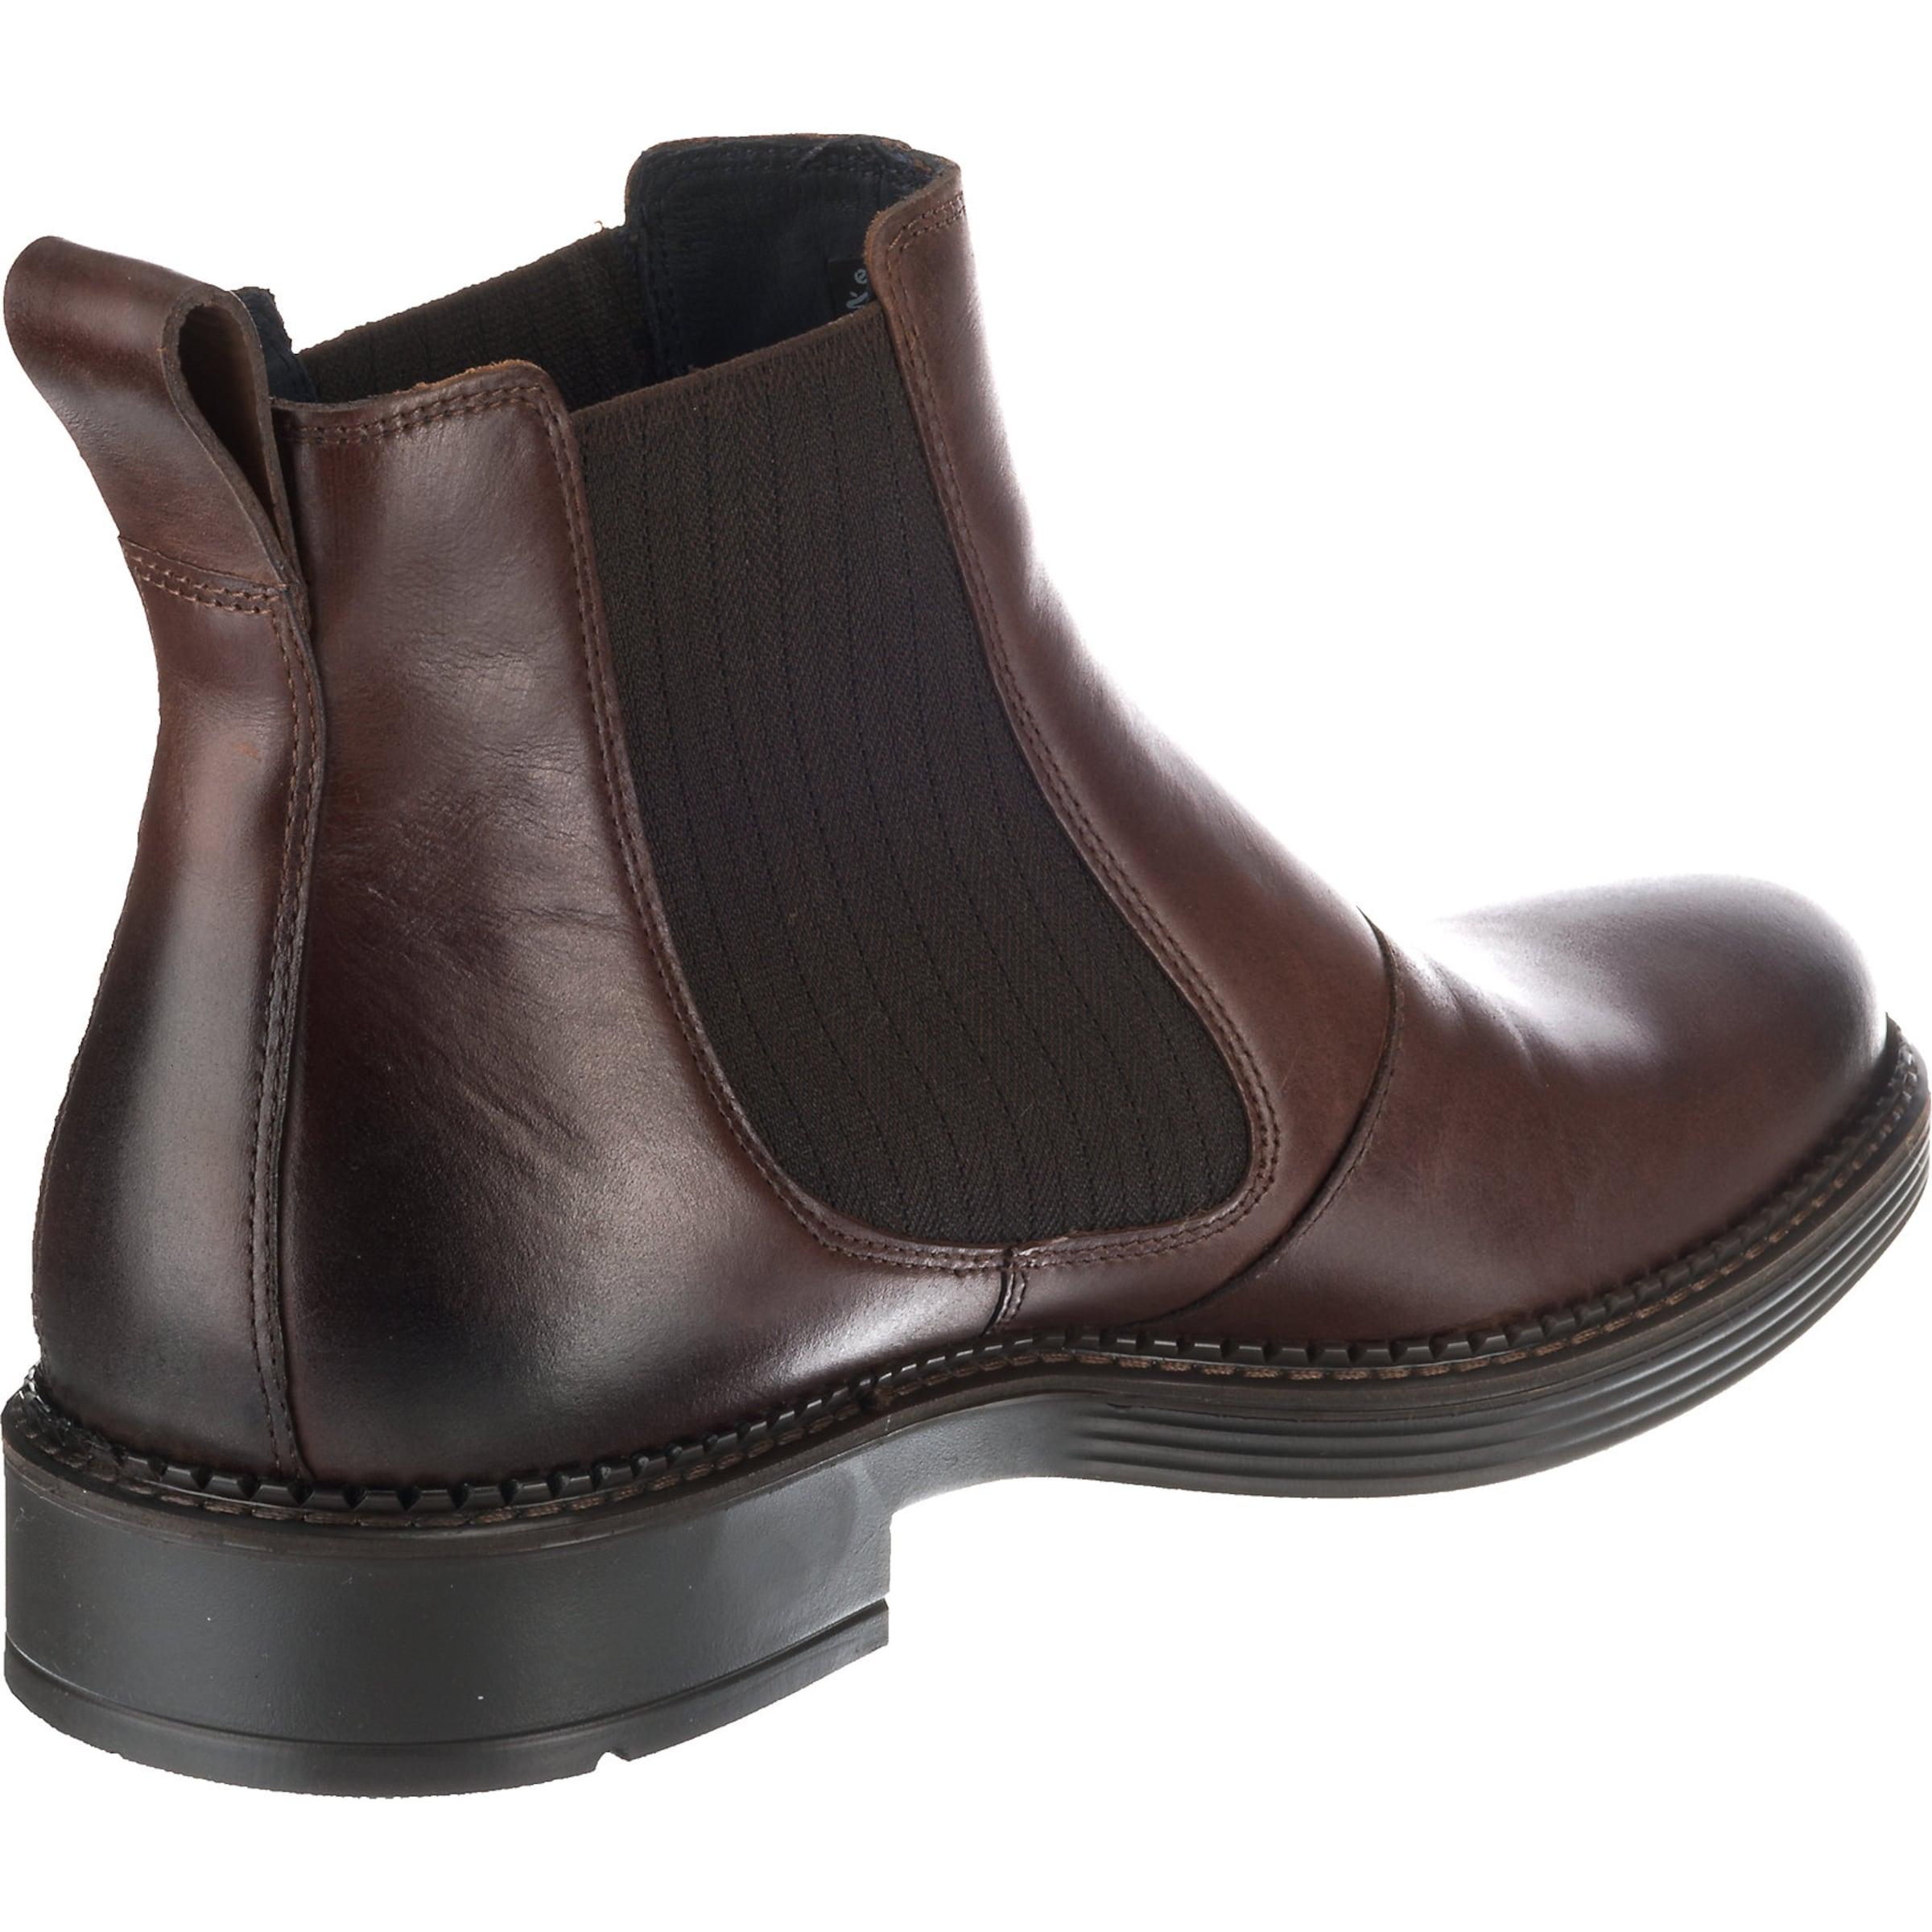 Braun Ecco Ecco 'newcastle' In Boots 7IYbygf6mv